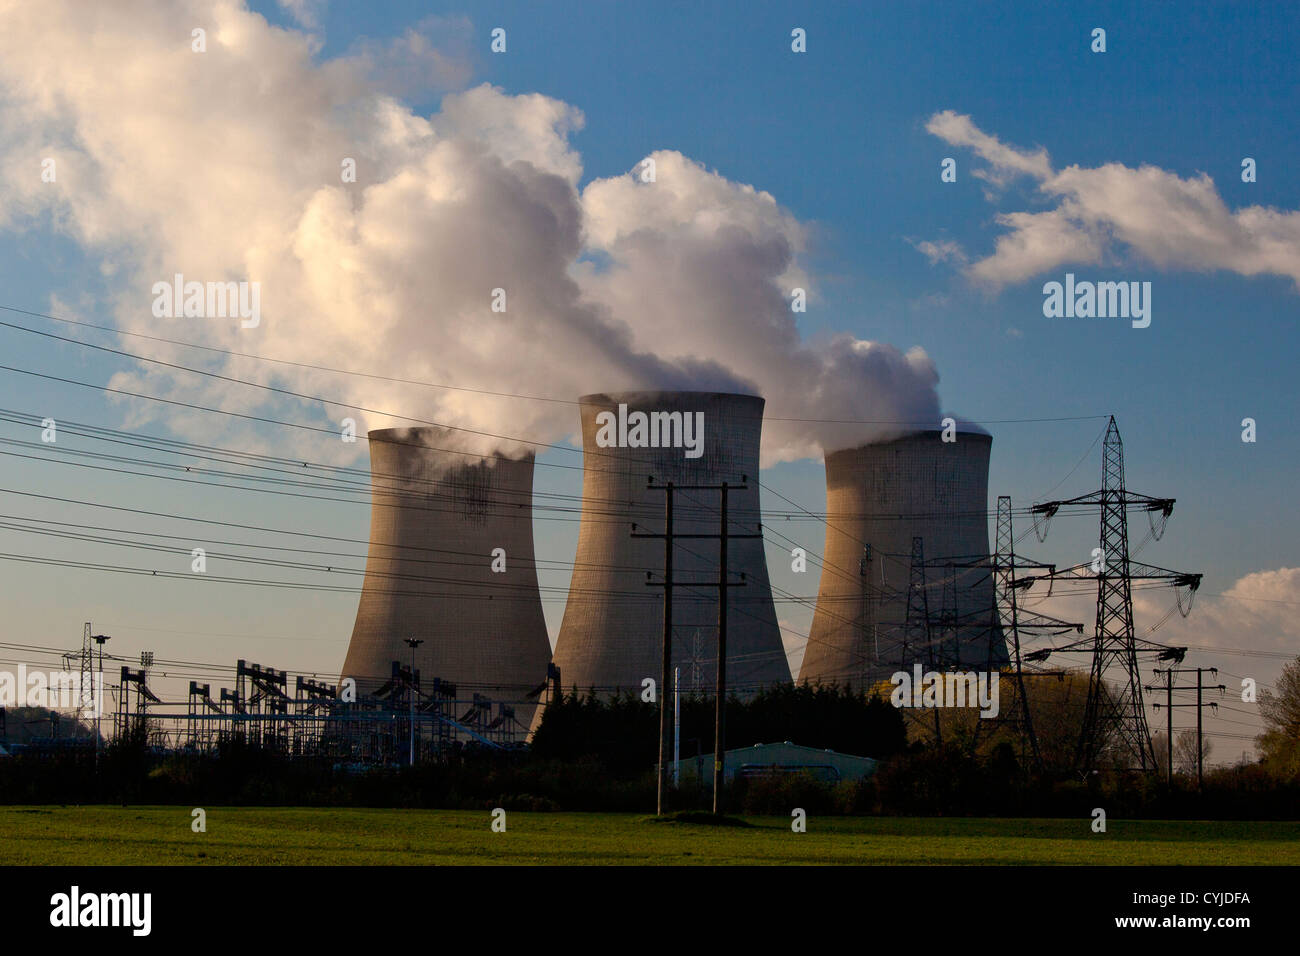 Kühltürme und Strommasten an Kohle abgefeuert Kraftwerk in England Stockbild